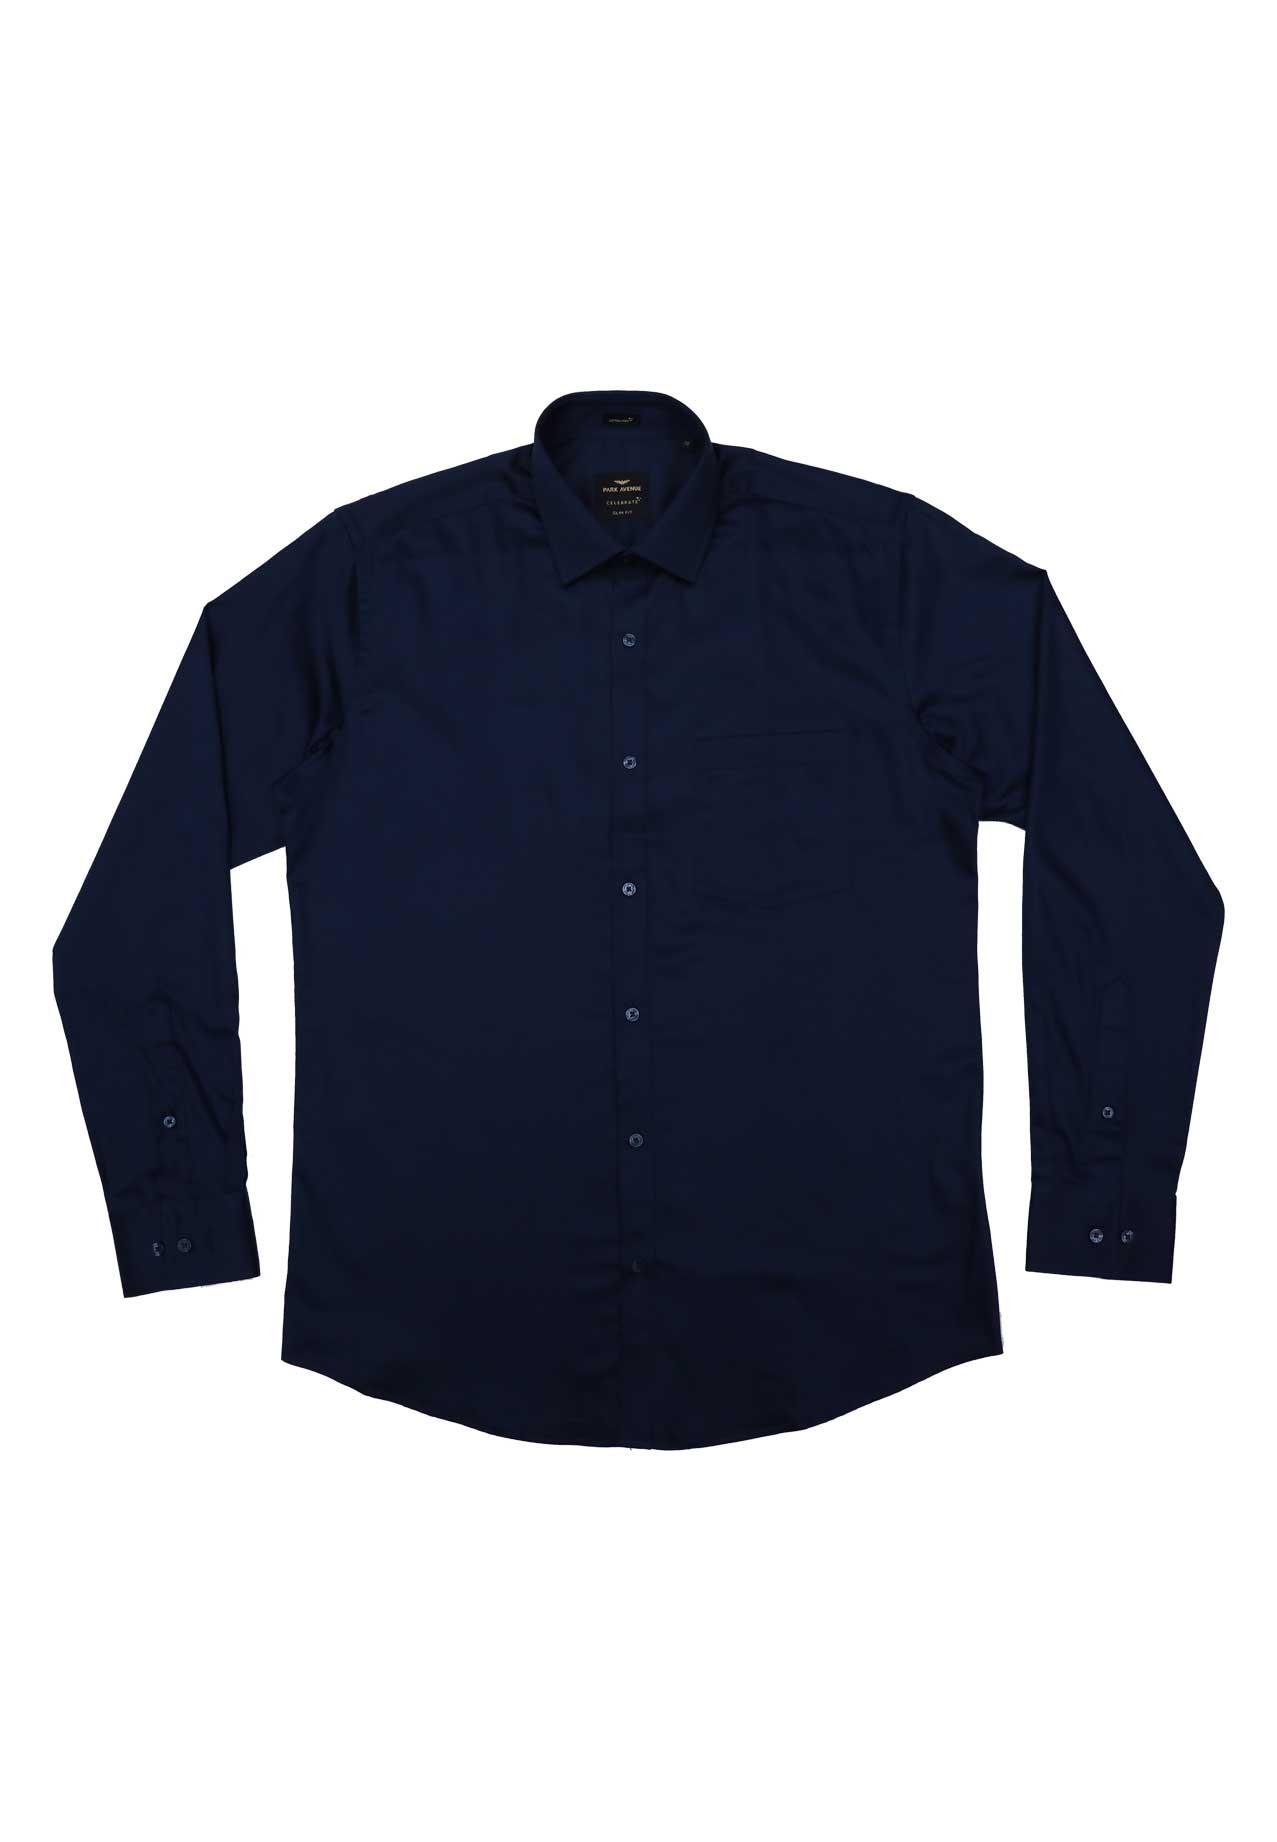 Park Avenue PISY00002-B8 Mens Shirt, Size 44